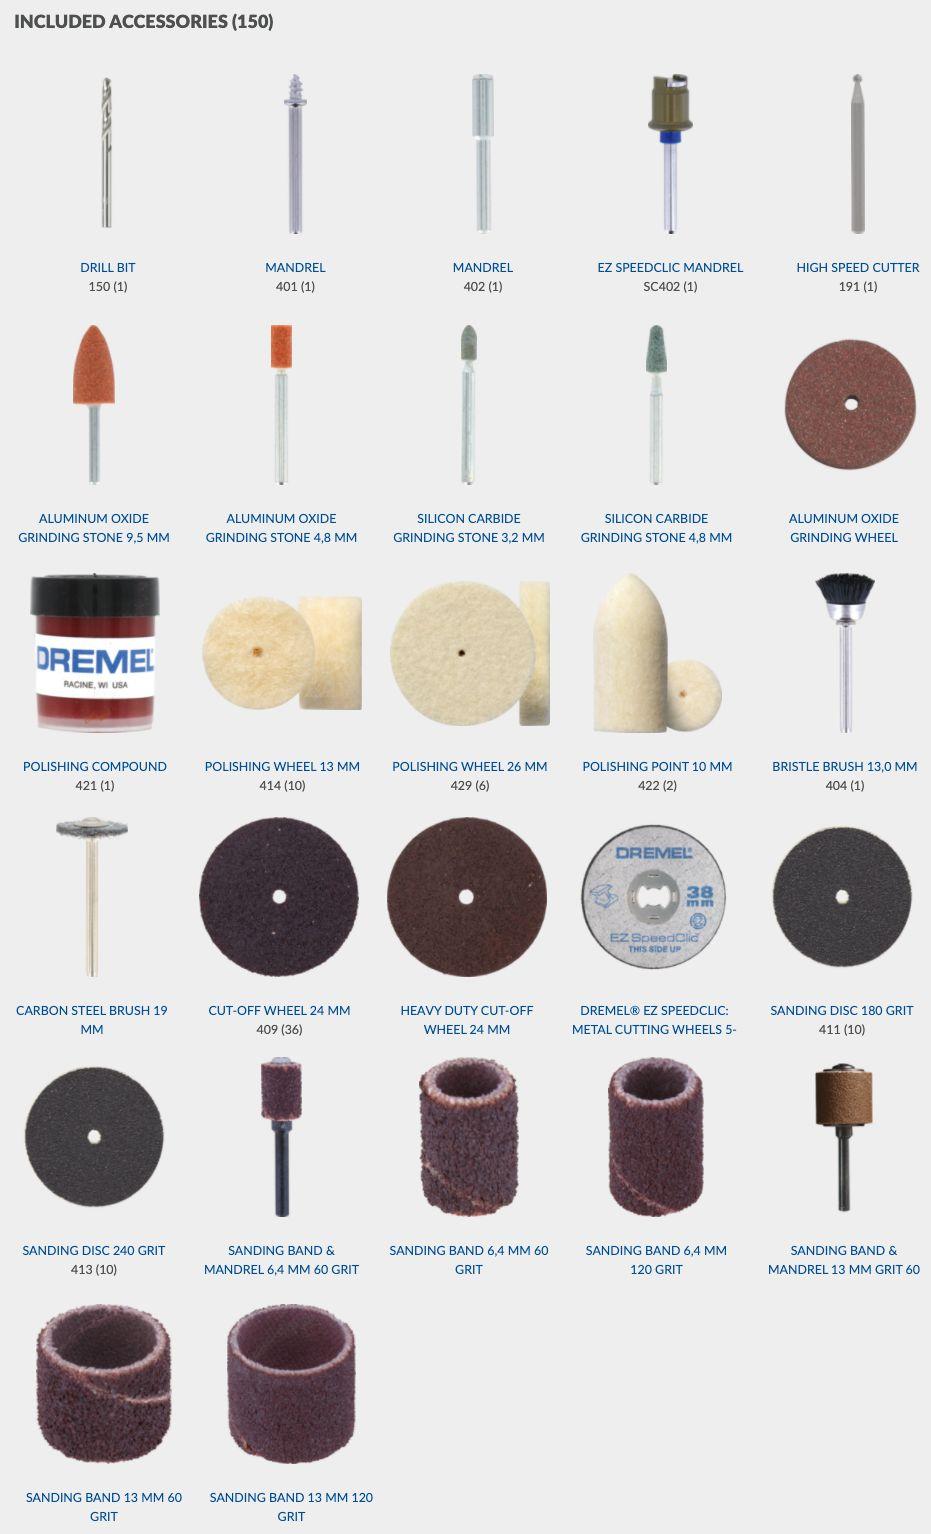 Dremel 150 pcs Accessories Set 724-150